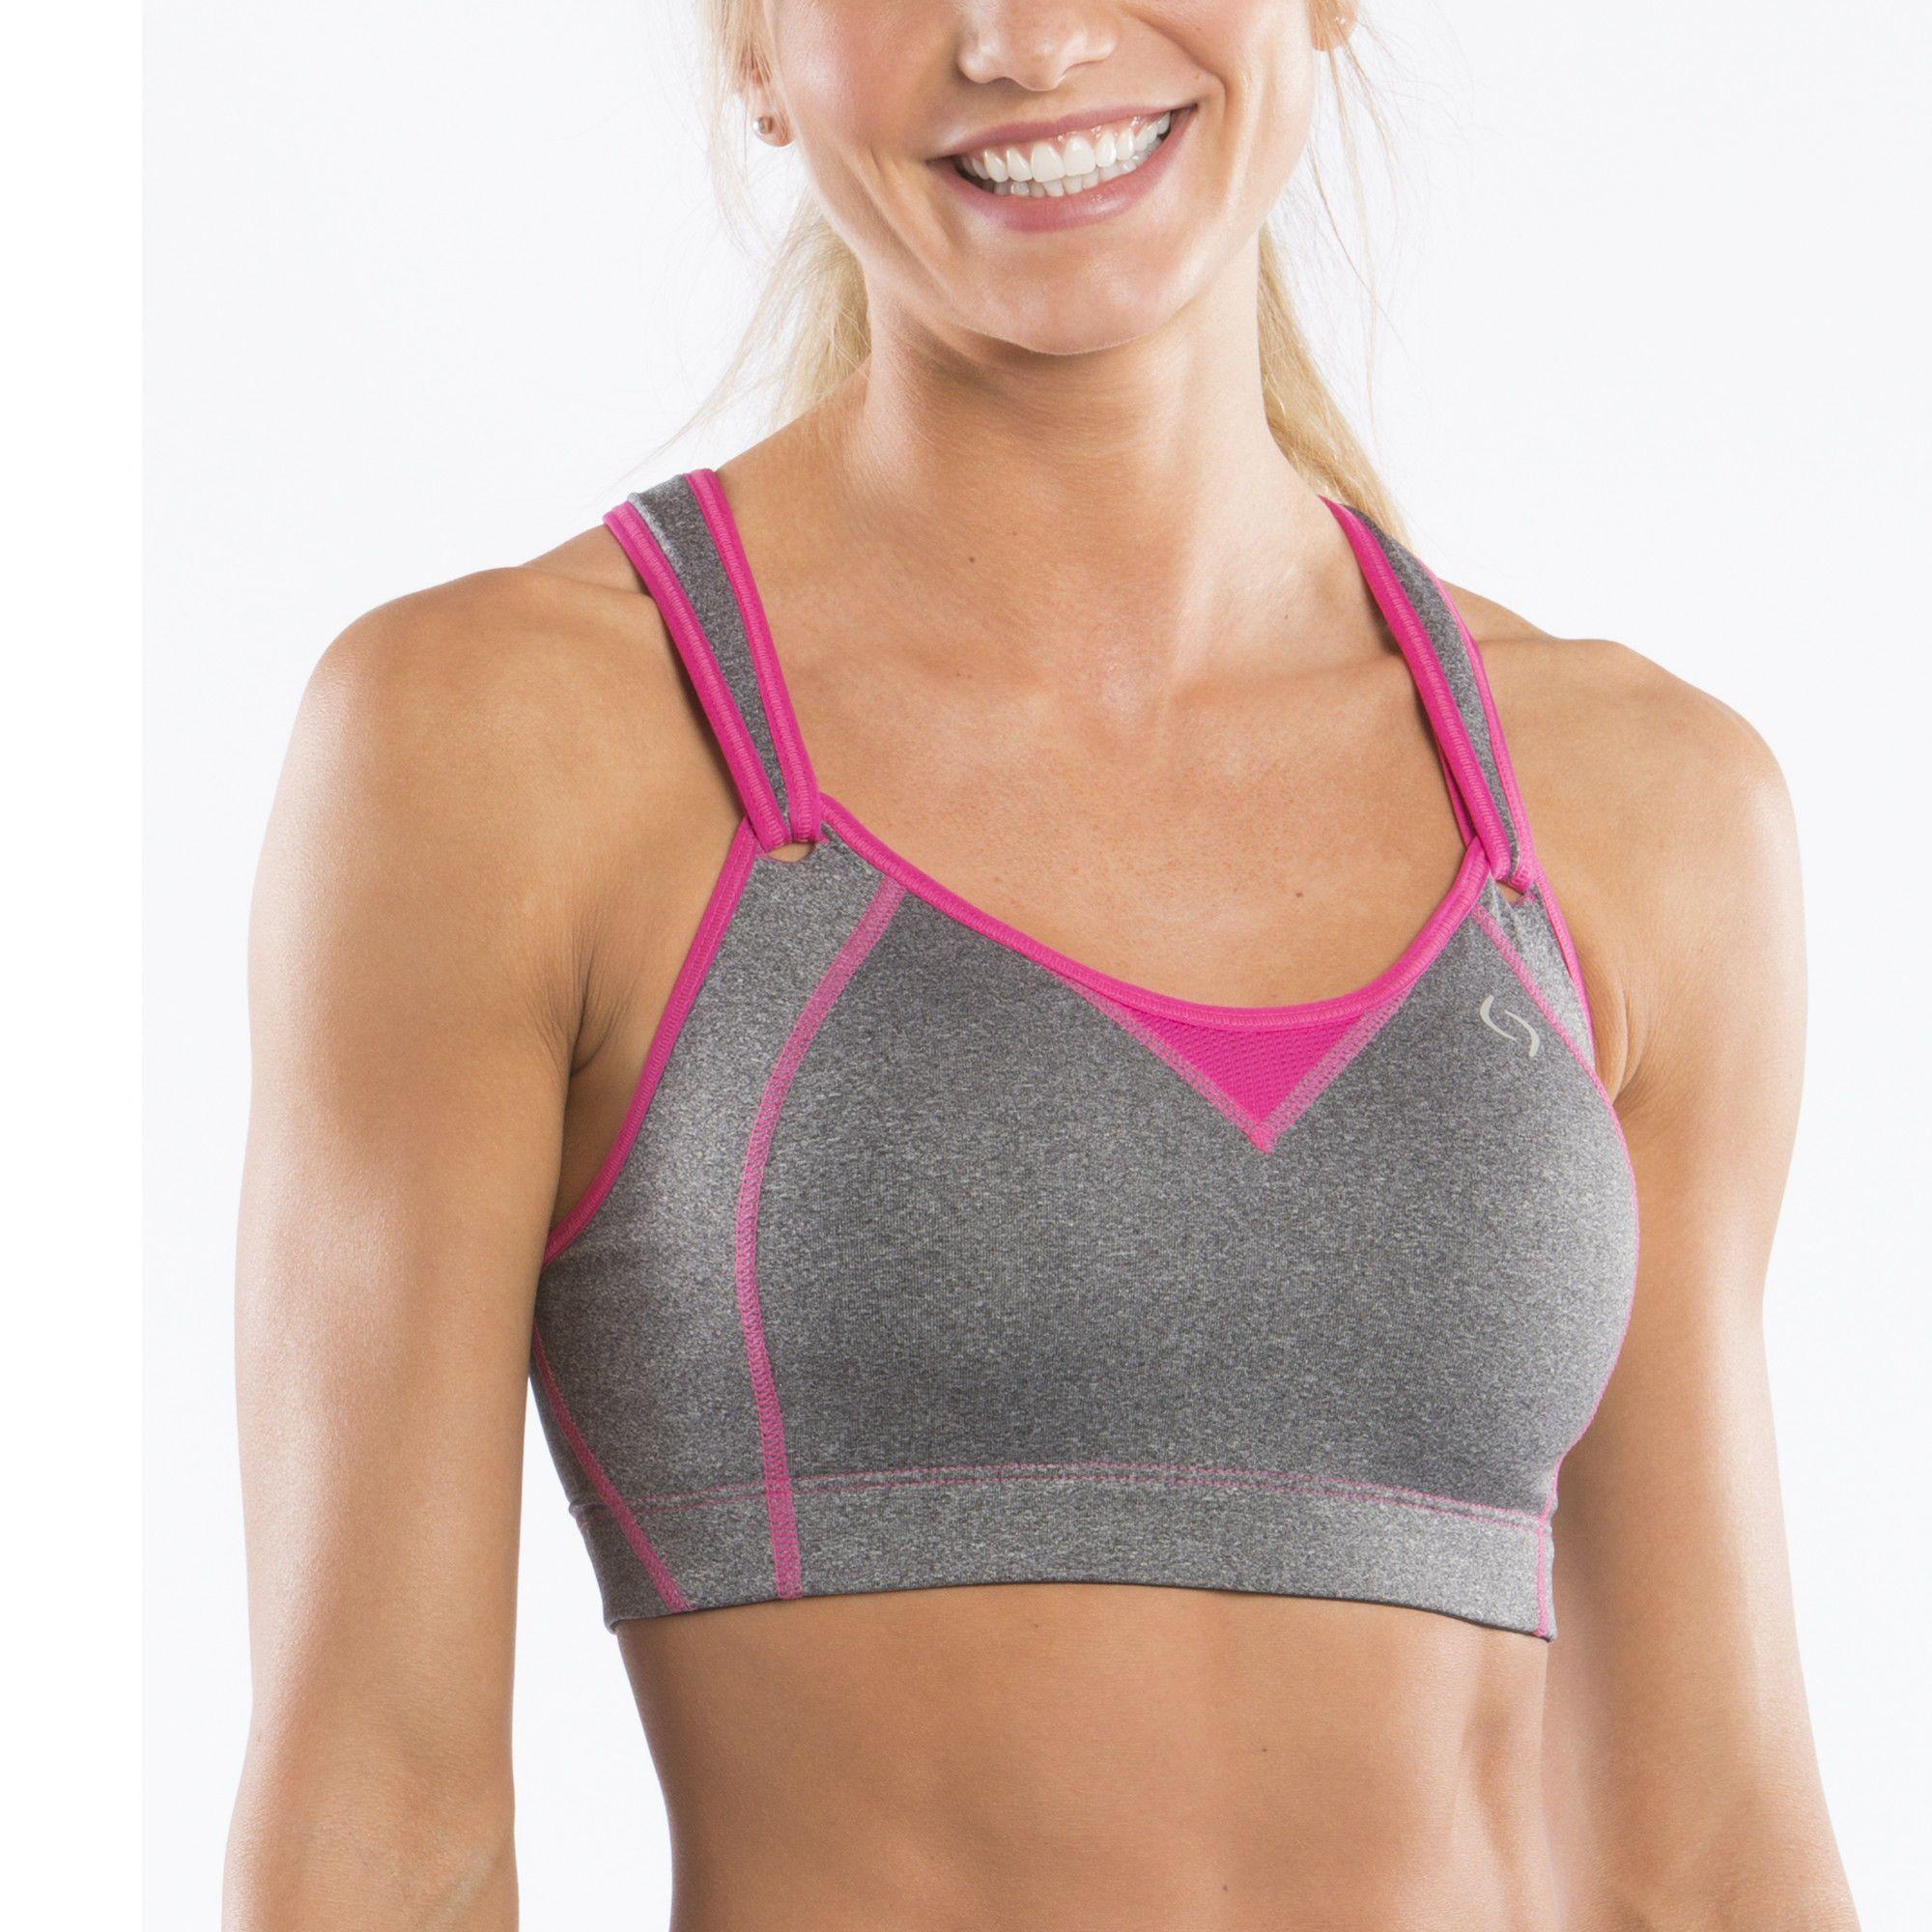 6d78c6752 Best sports bra for bounce-less support!...Rebound Racer Sports Bra